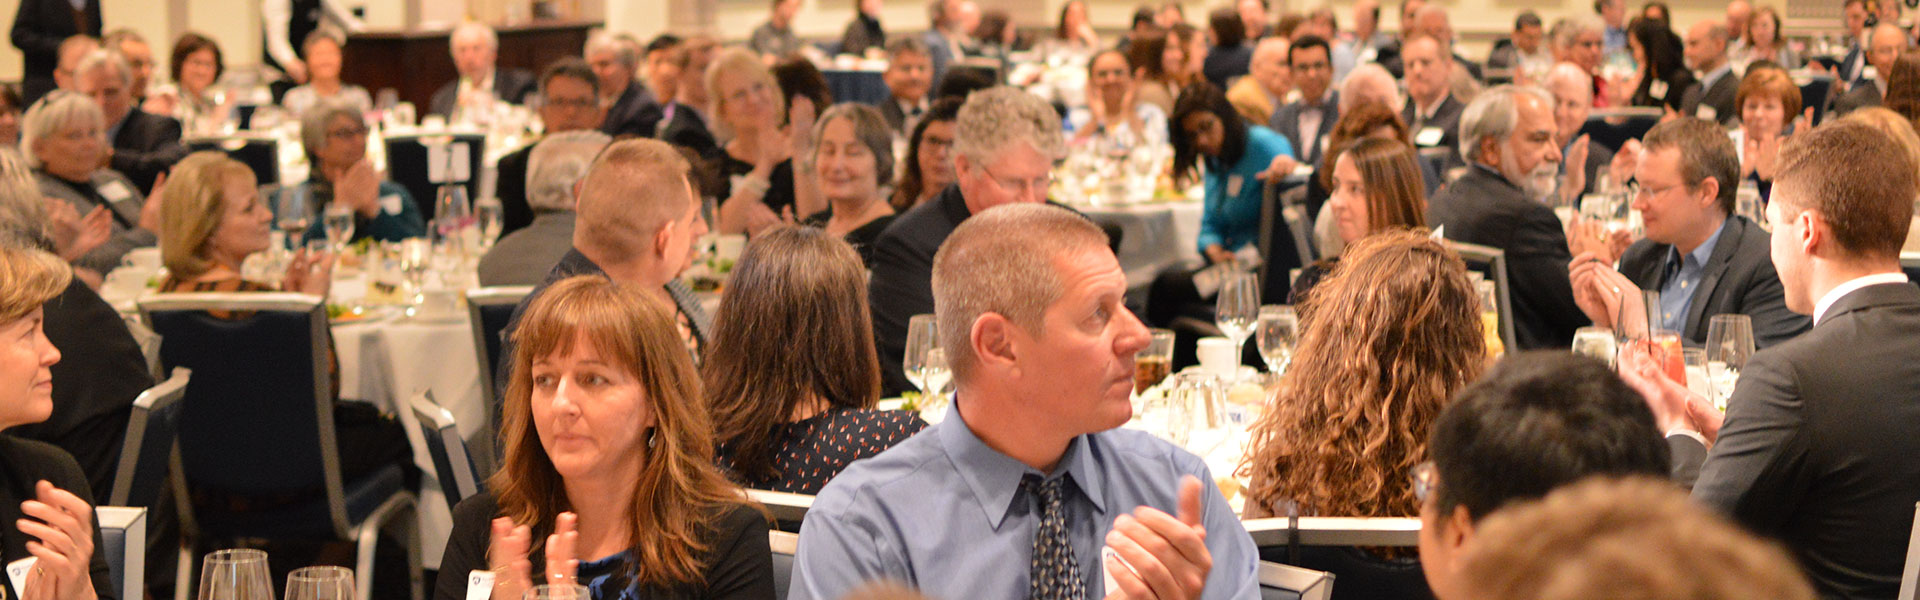 Wilson Banquet